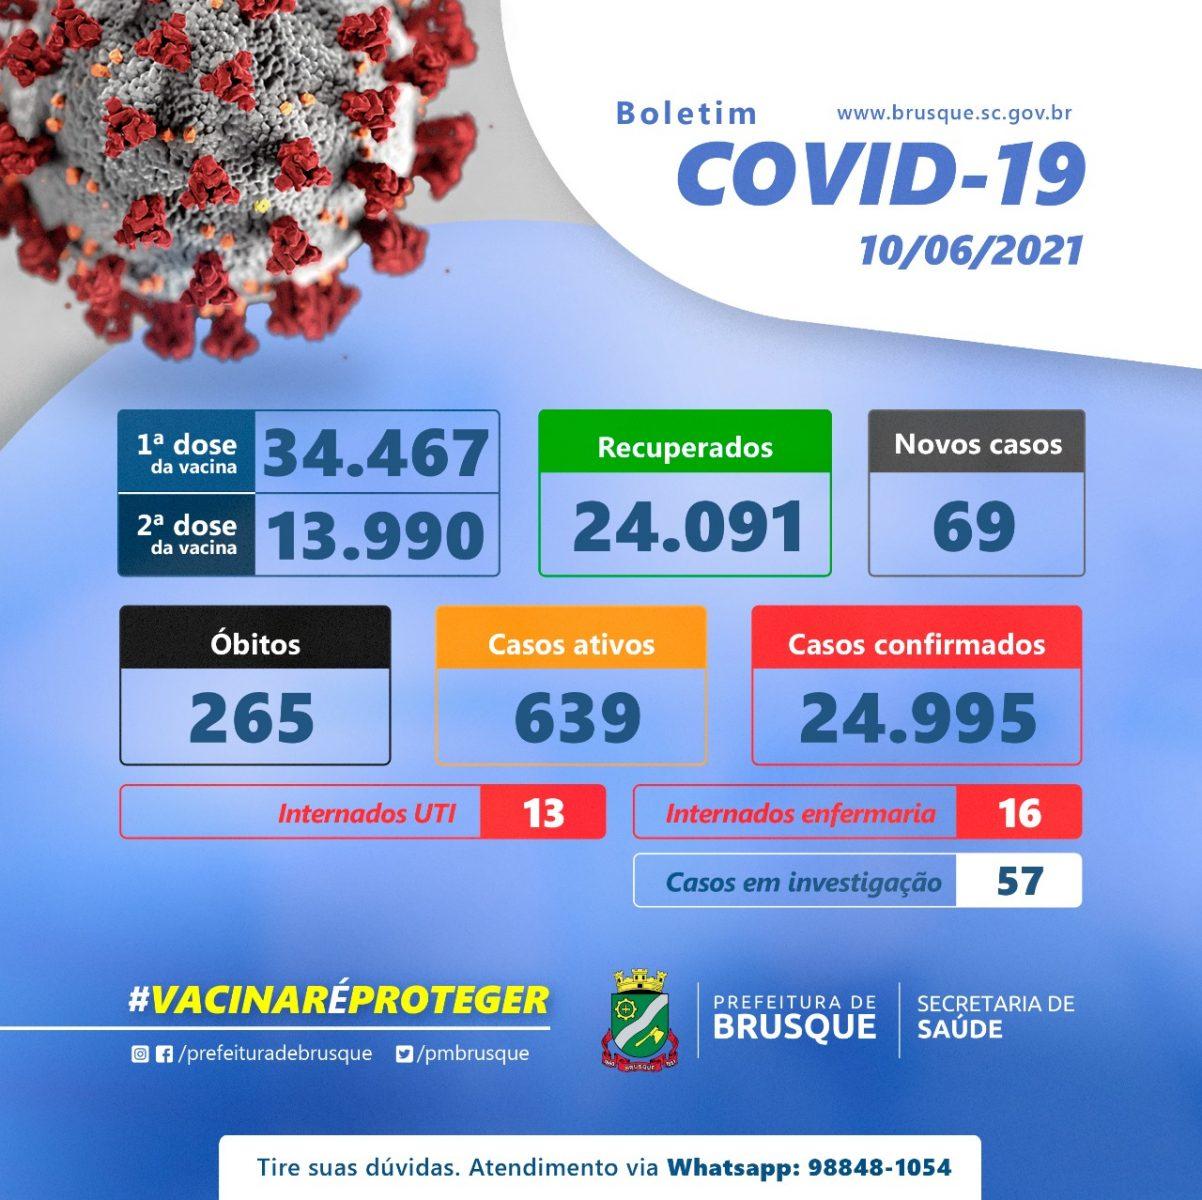 Covid-19: Confira o boletim epidemiológico desta quinta-feira (10)